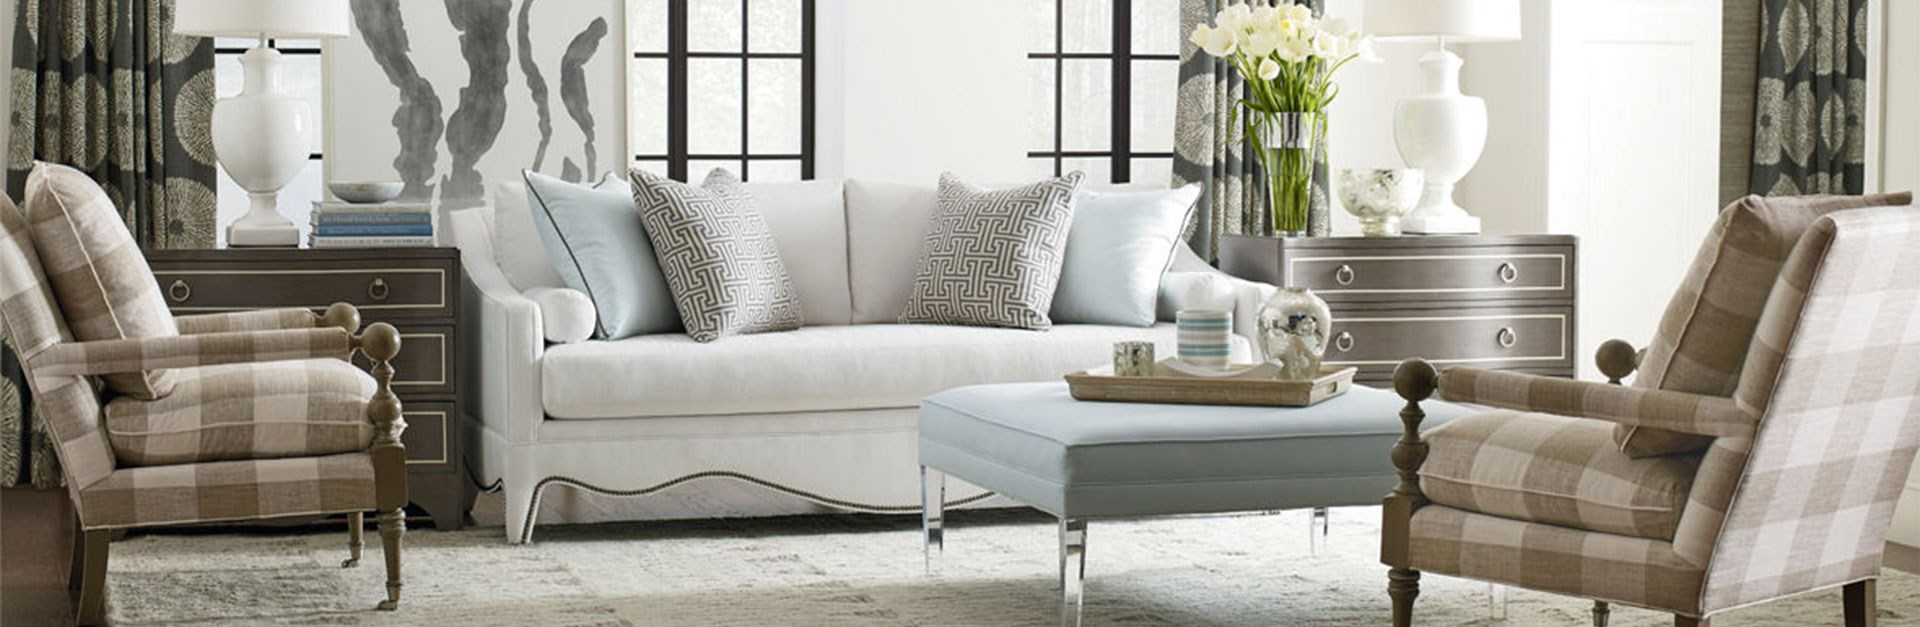 Shop Malouf Furniture